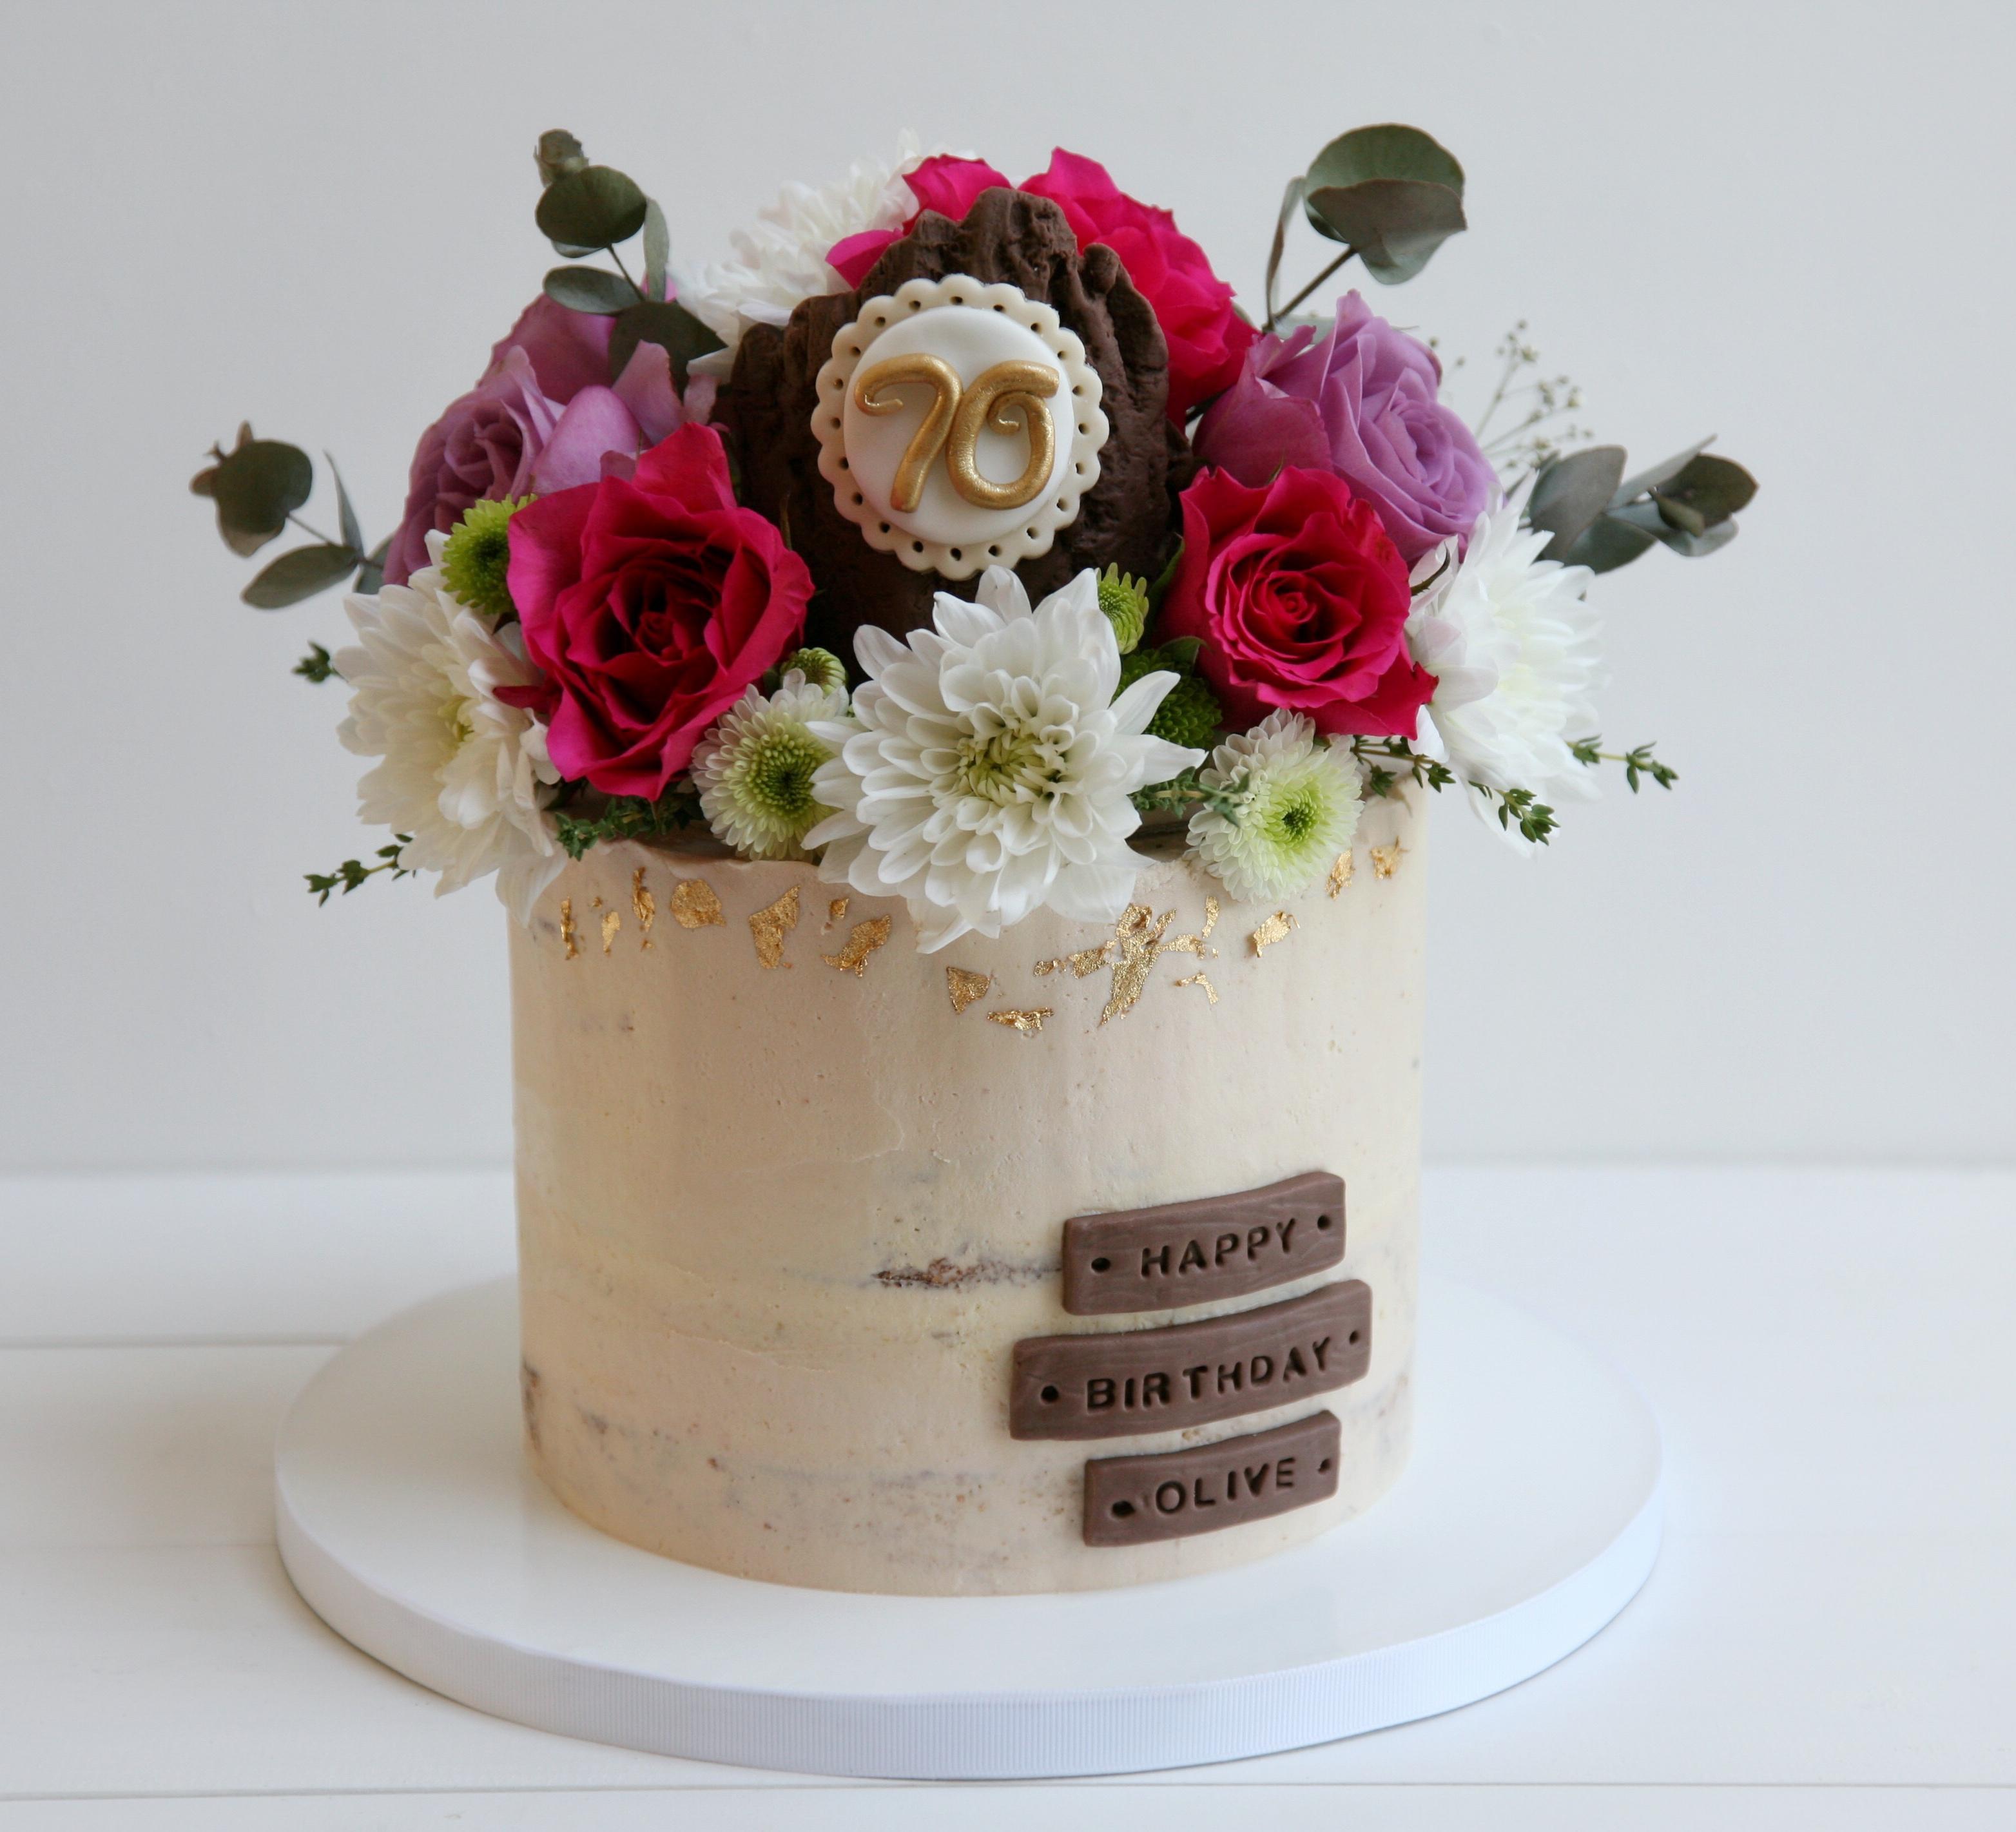 Semi naked 70th birthday cake